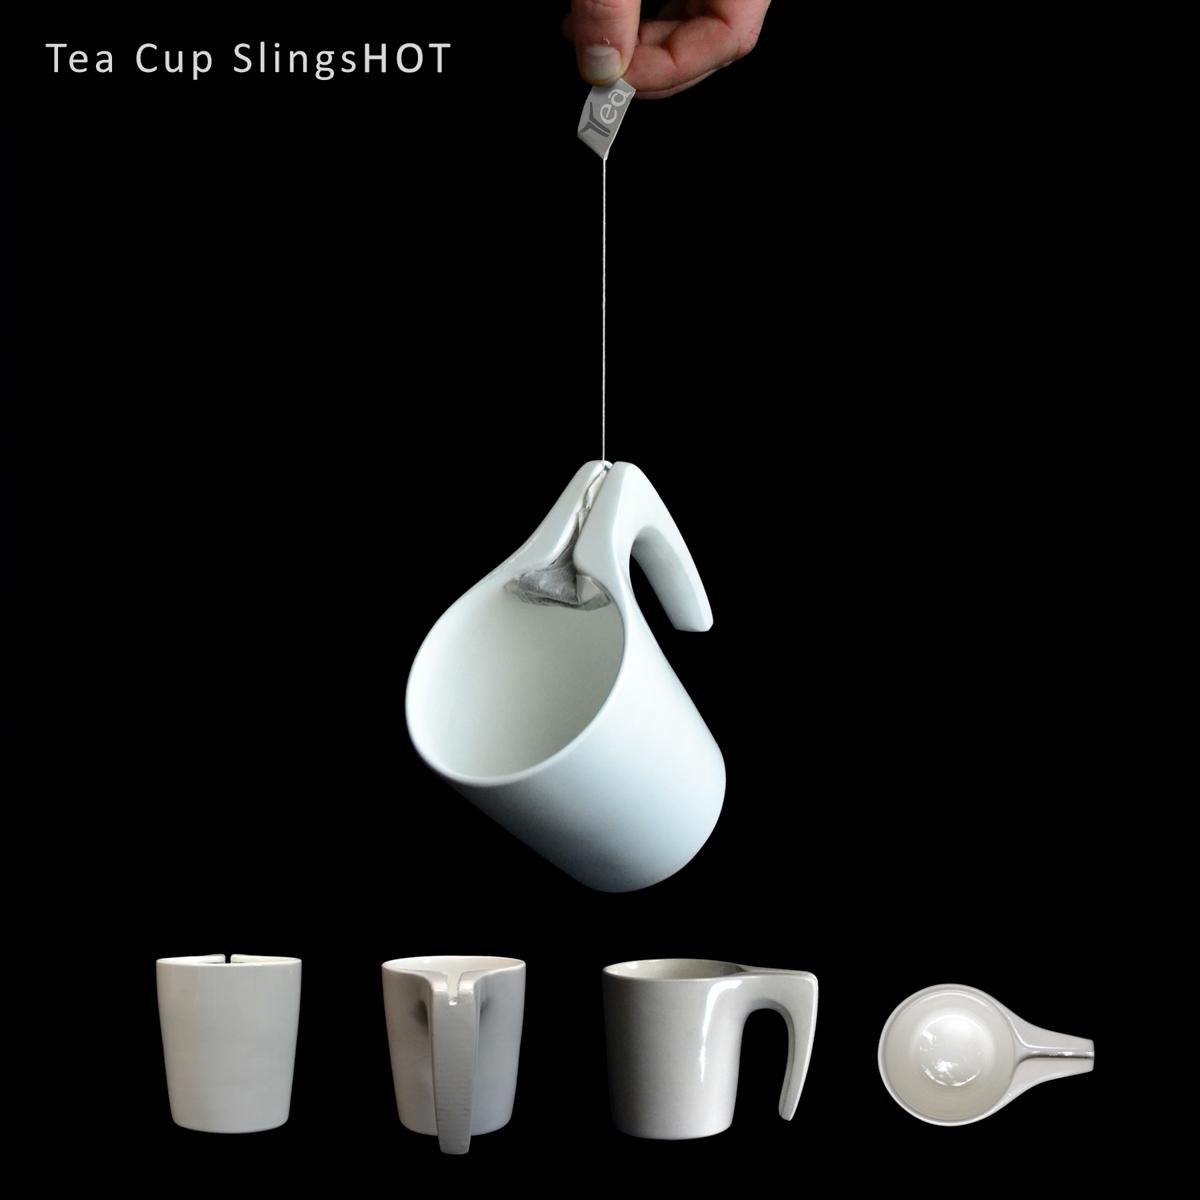 The Tea Cup SlingsHOT Means No More Wet Tea Bags